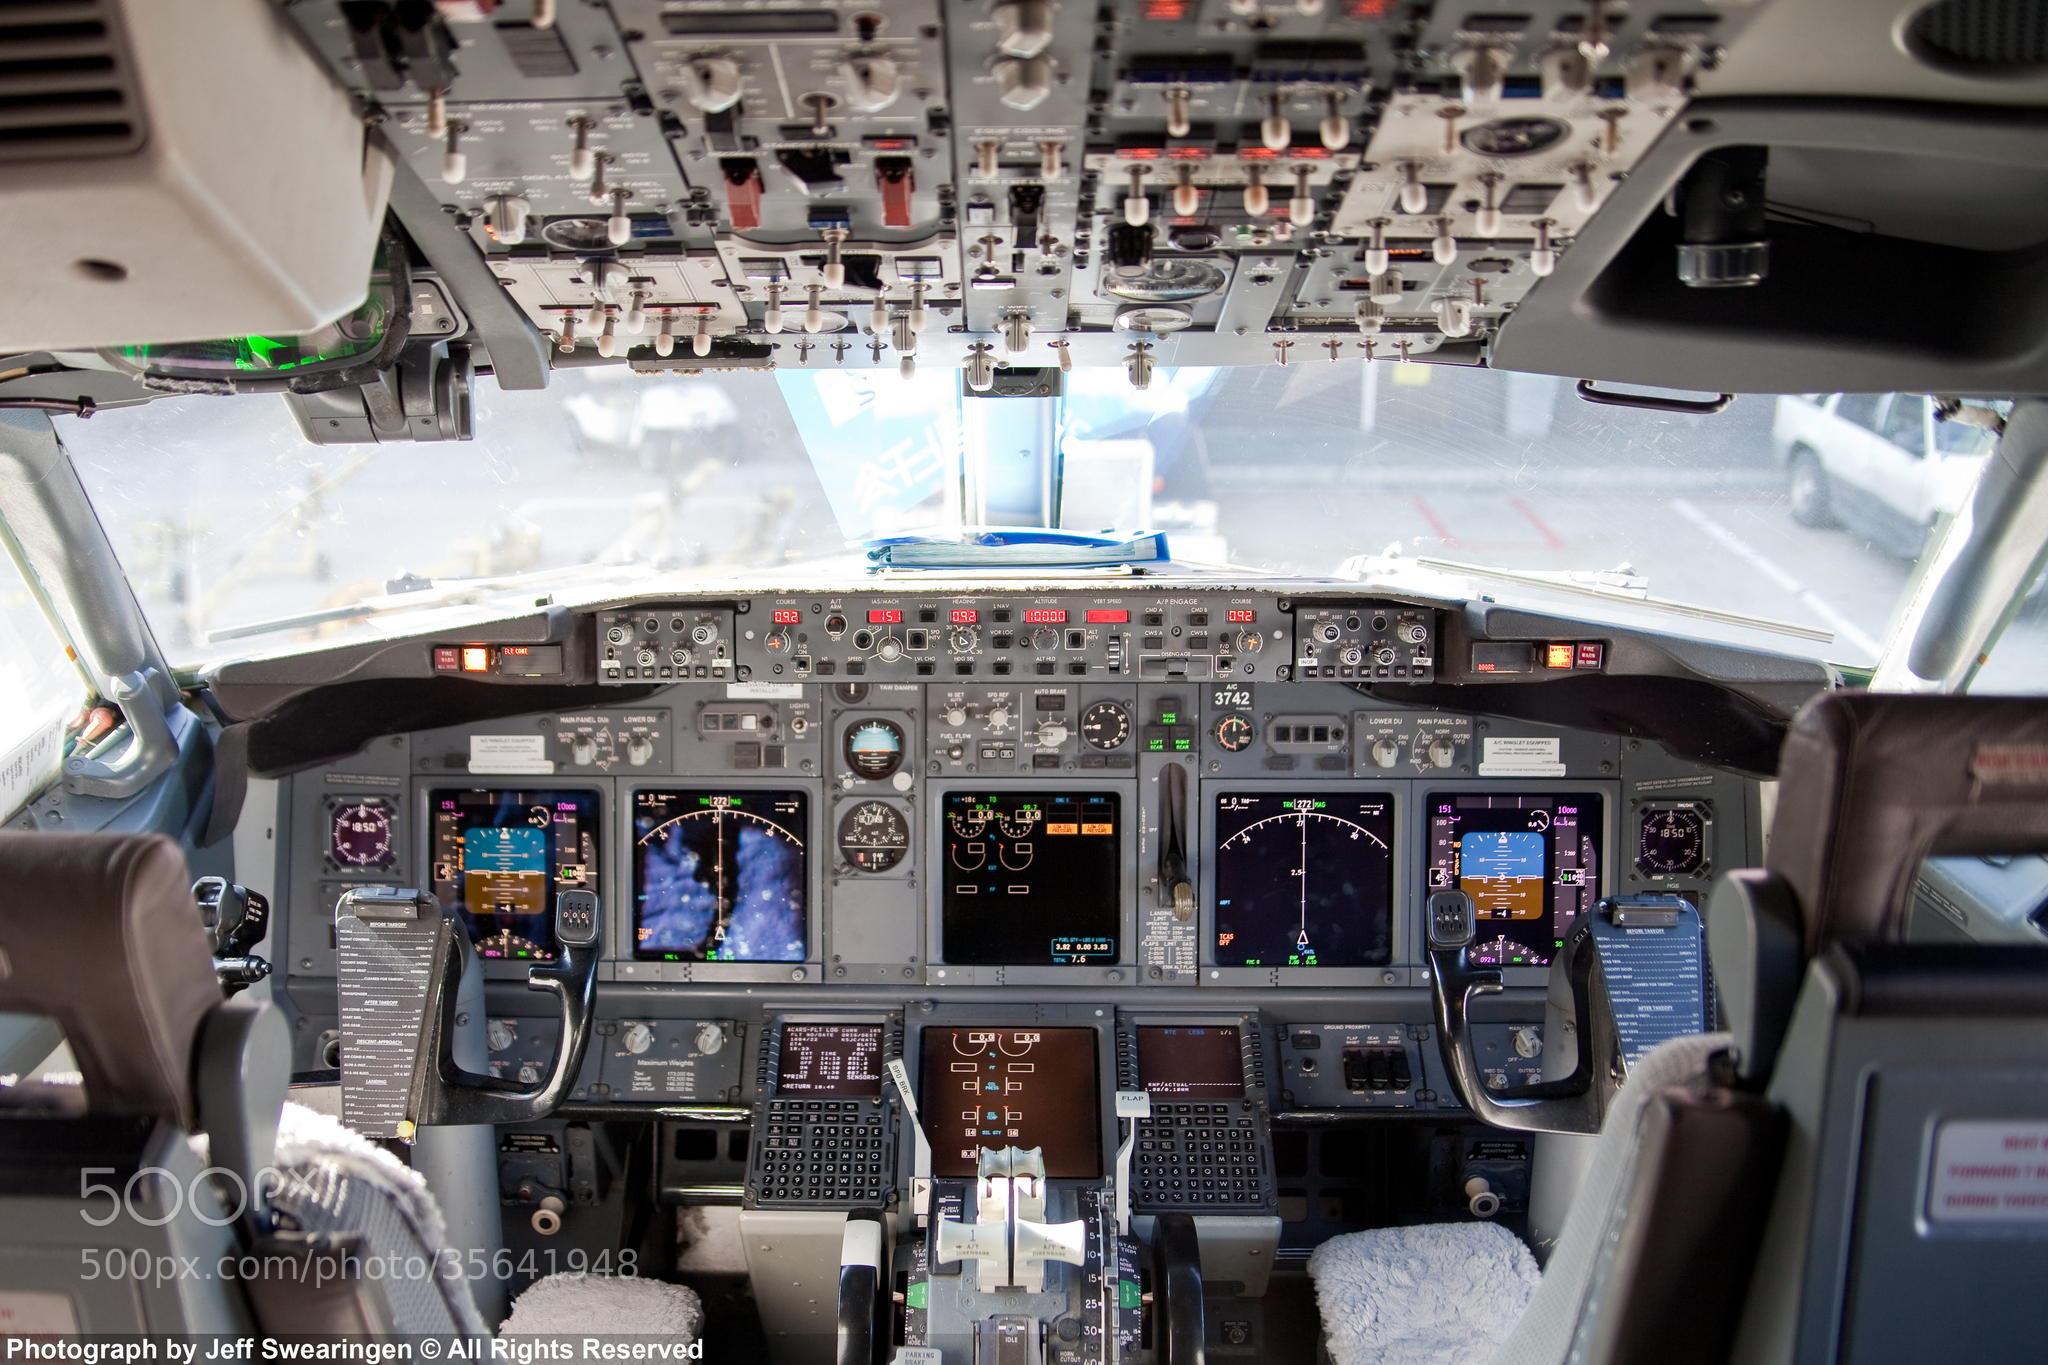 2552x1701 Air France Airbus A380 800 Landing Gear Retracted Aircraft Wallpaper 3717